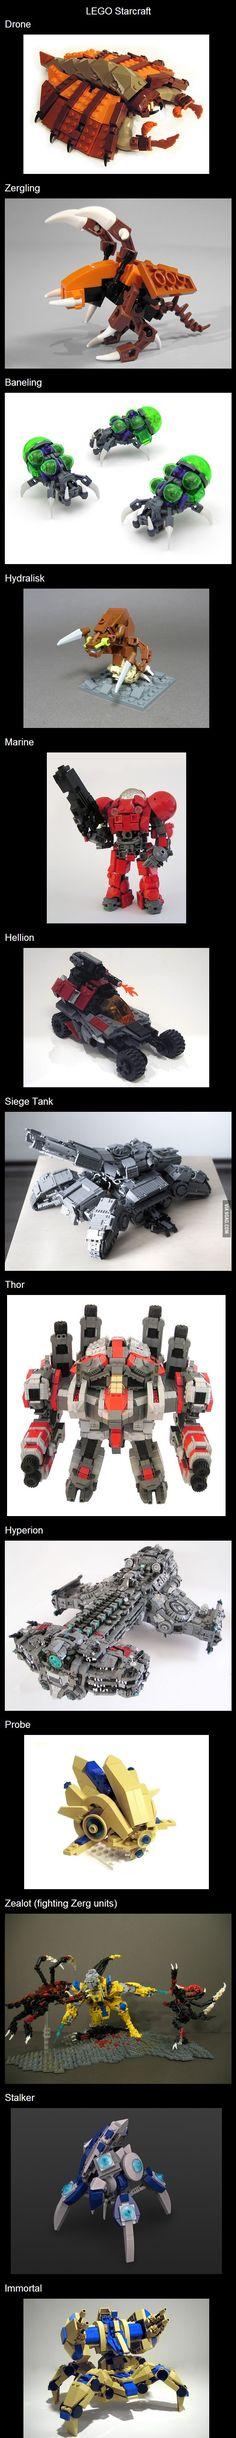 LEGO Starcraft Wishlist